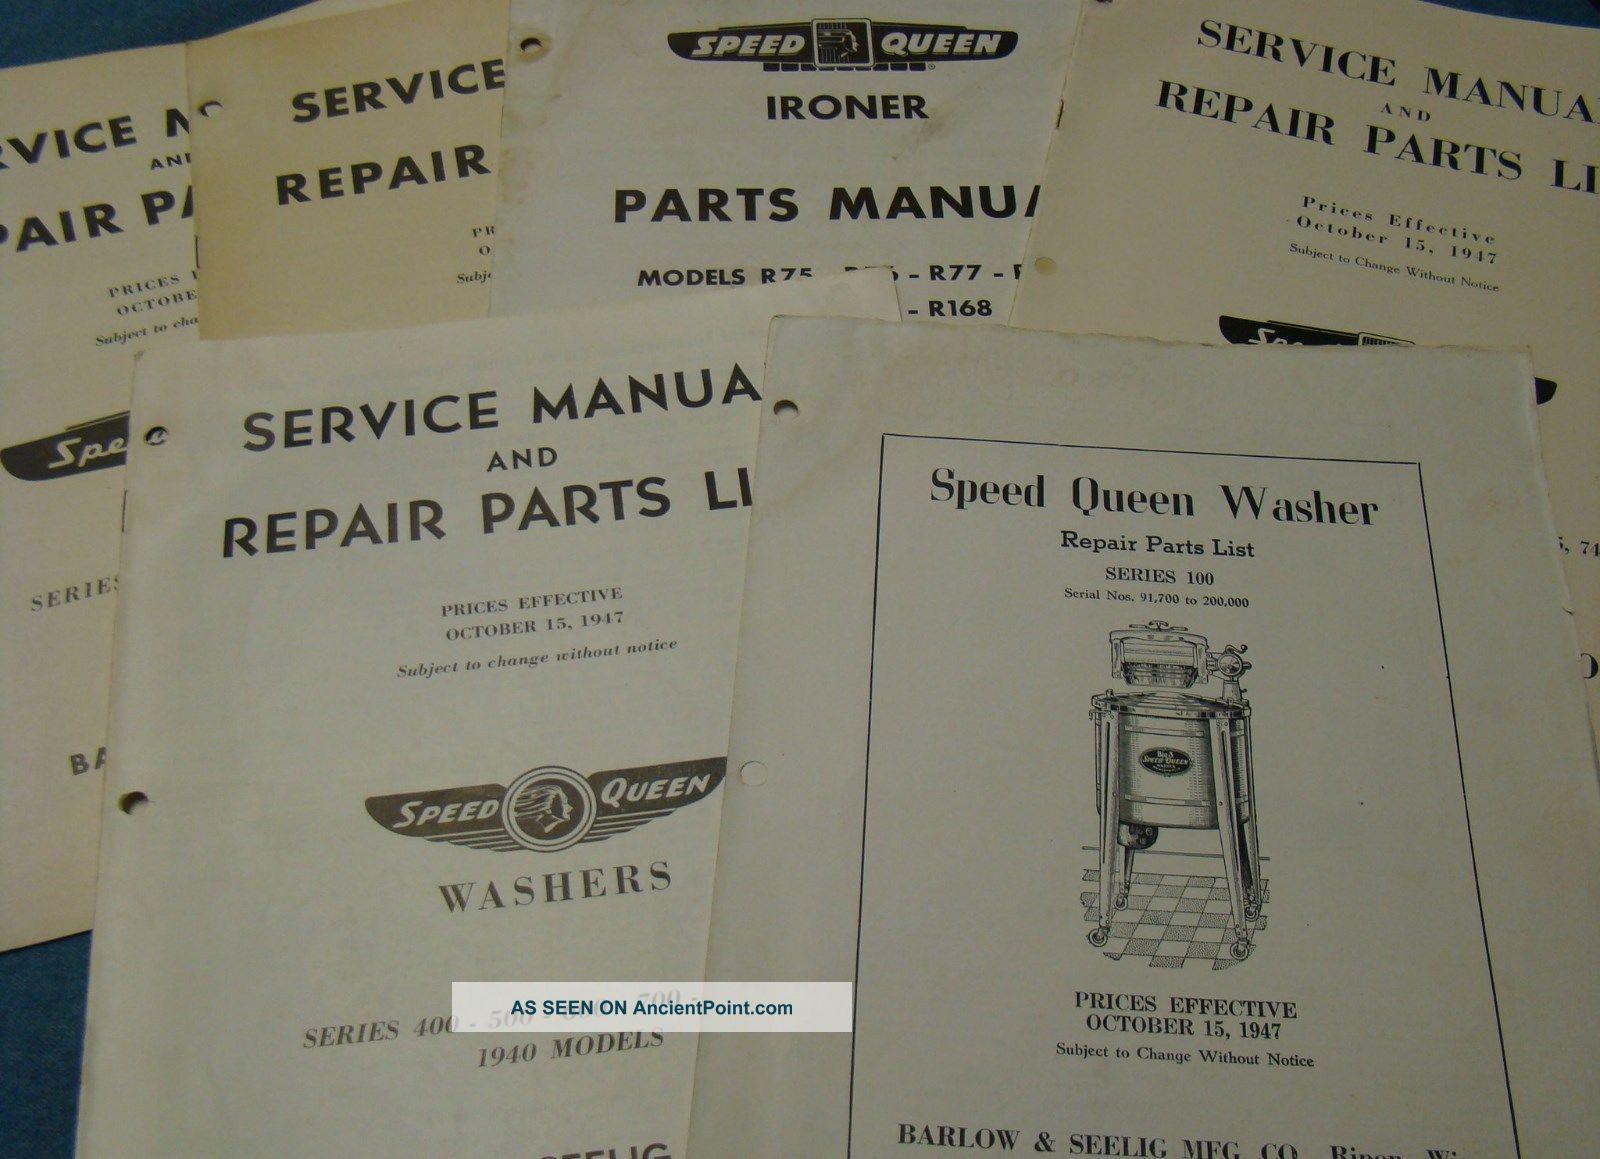 6 1940s - 50s Speed Queen Washing Machine Manuals & Parts Lists Vintage Washer Washing Machines photo